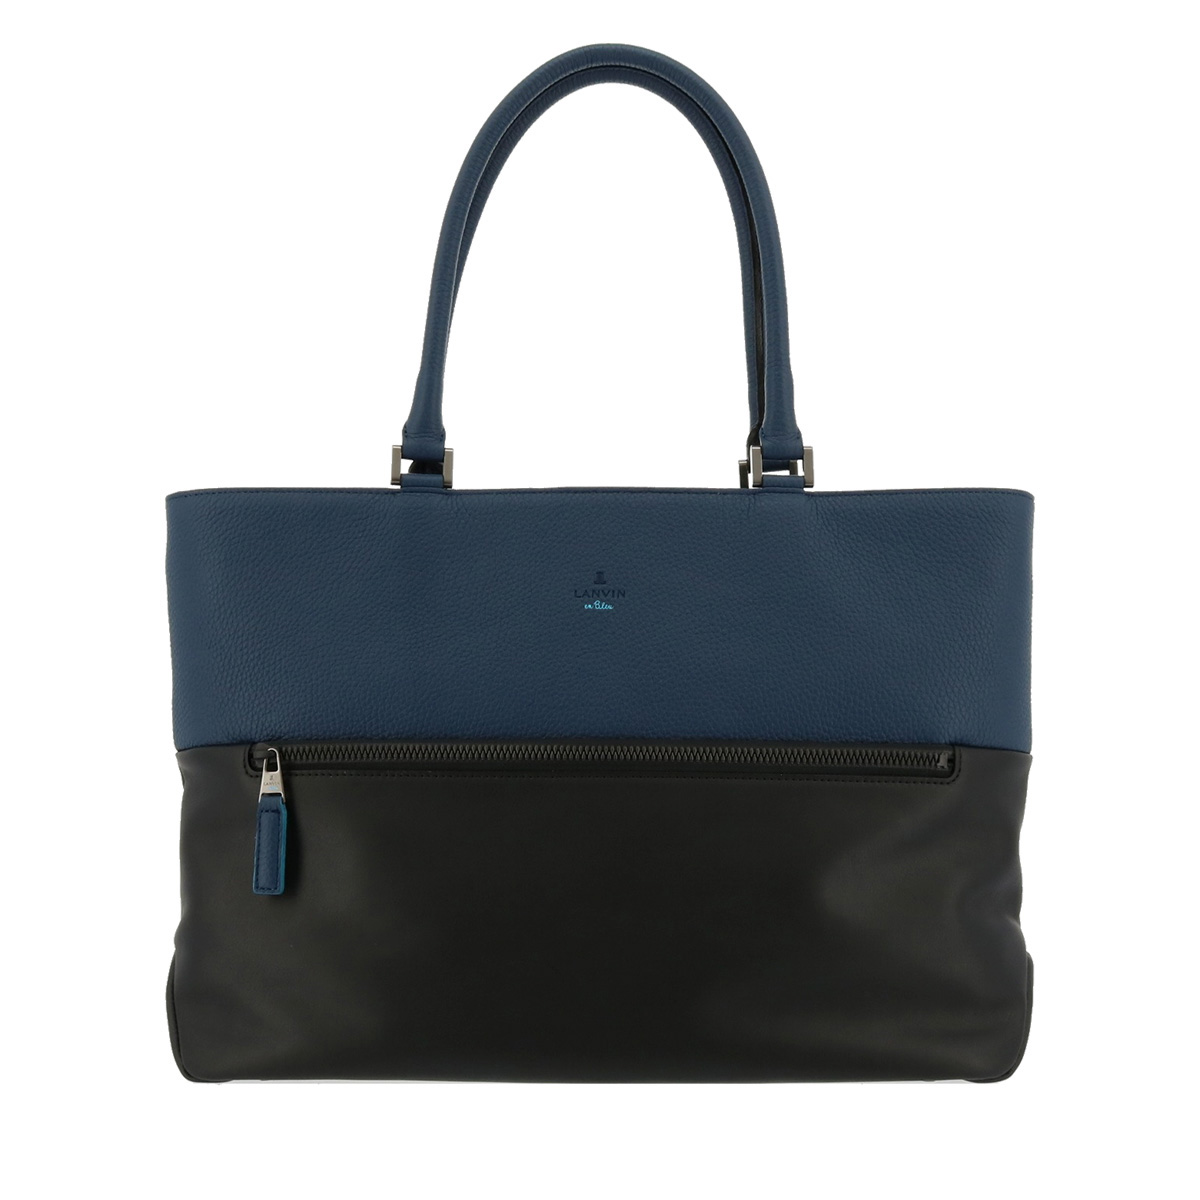 e70338a2fcb0 ランバンオンブルー LANVIN en Bleu SLY|スライ トートバッグ バッグ ...